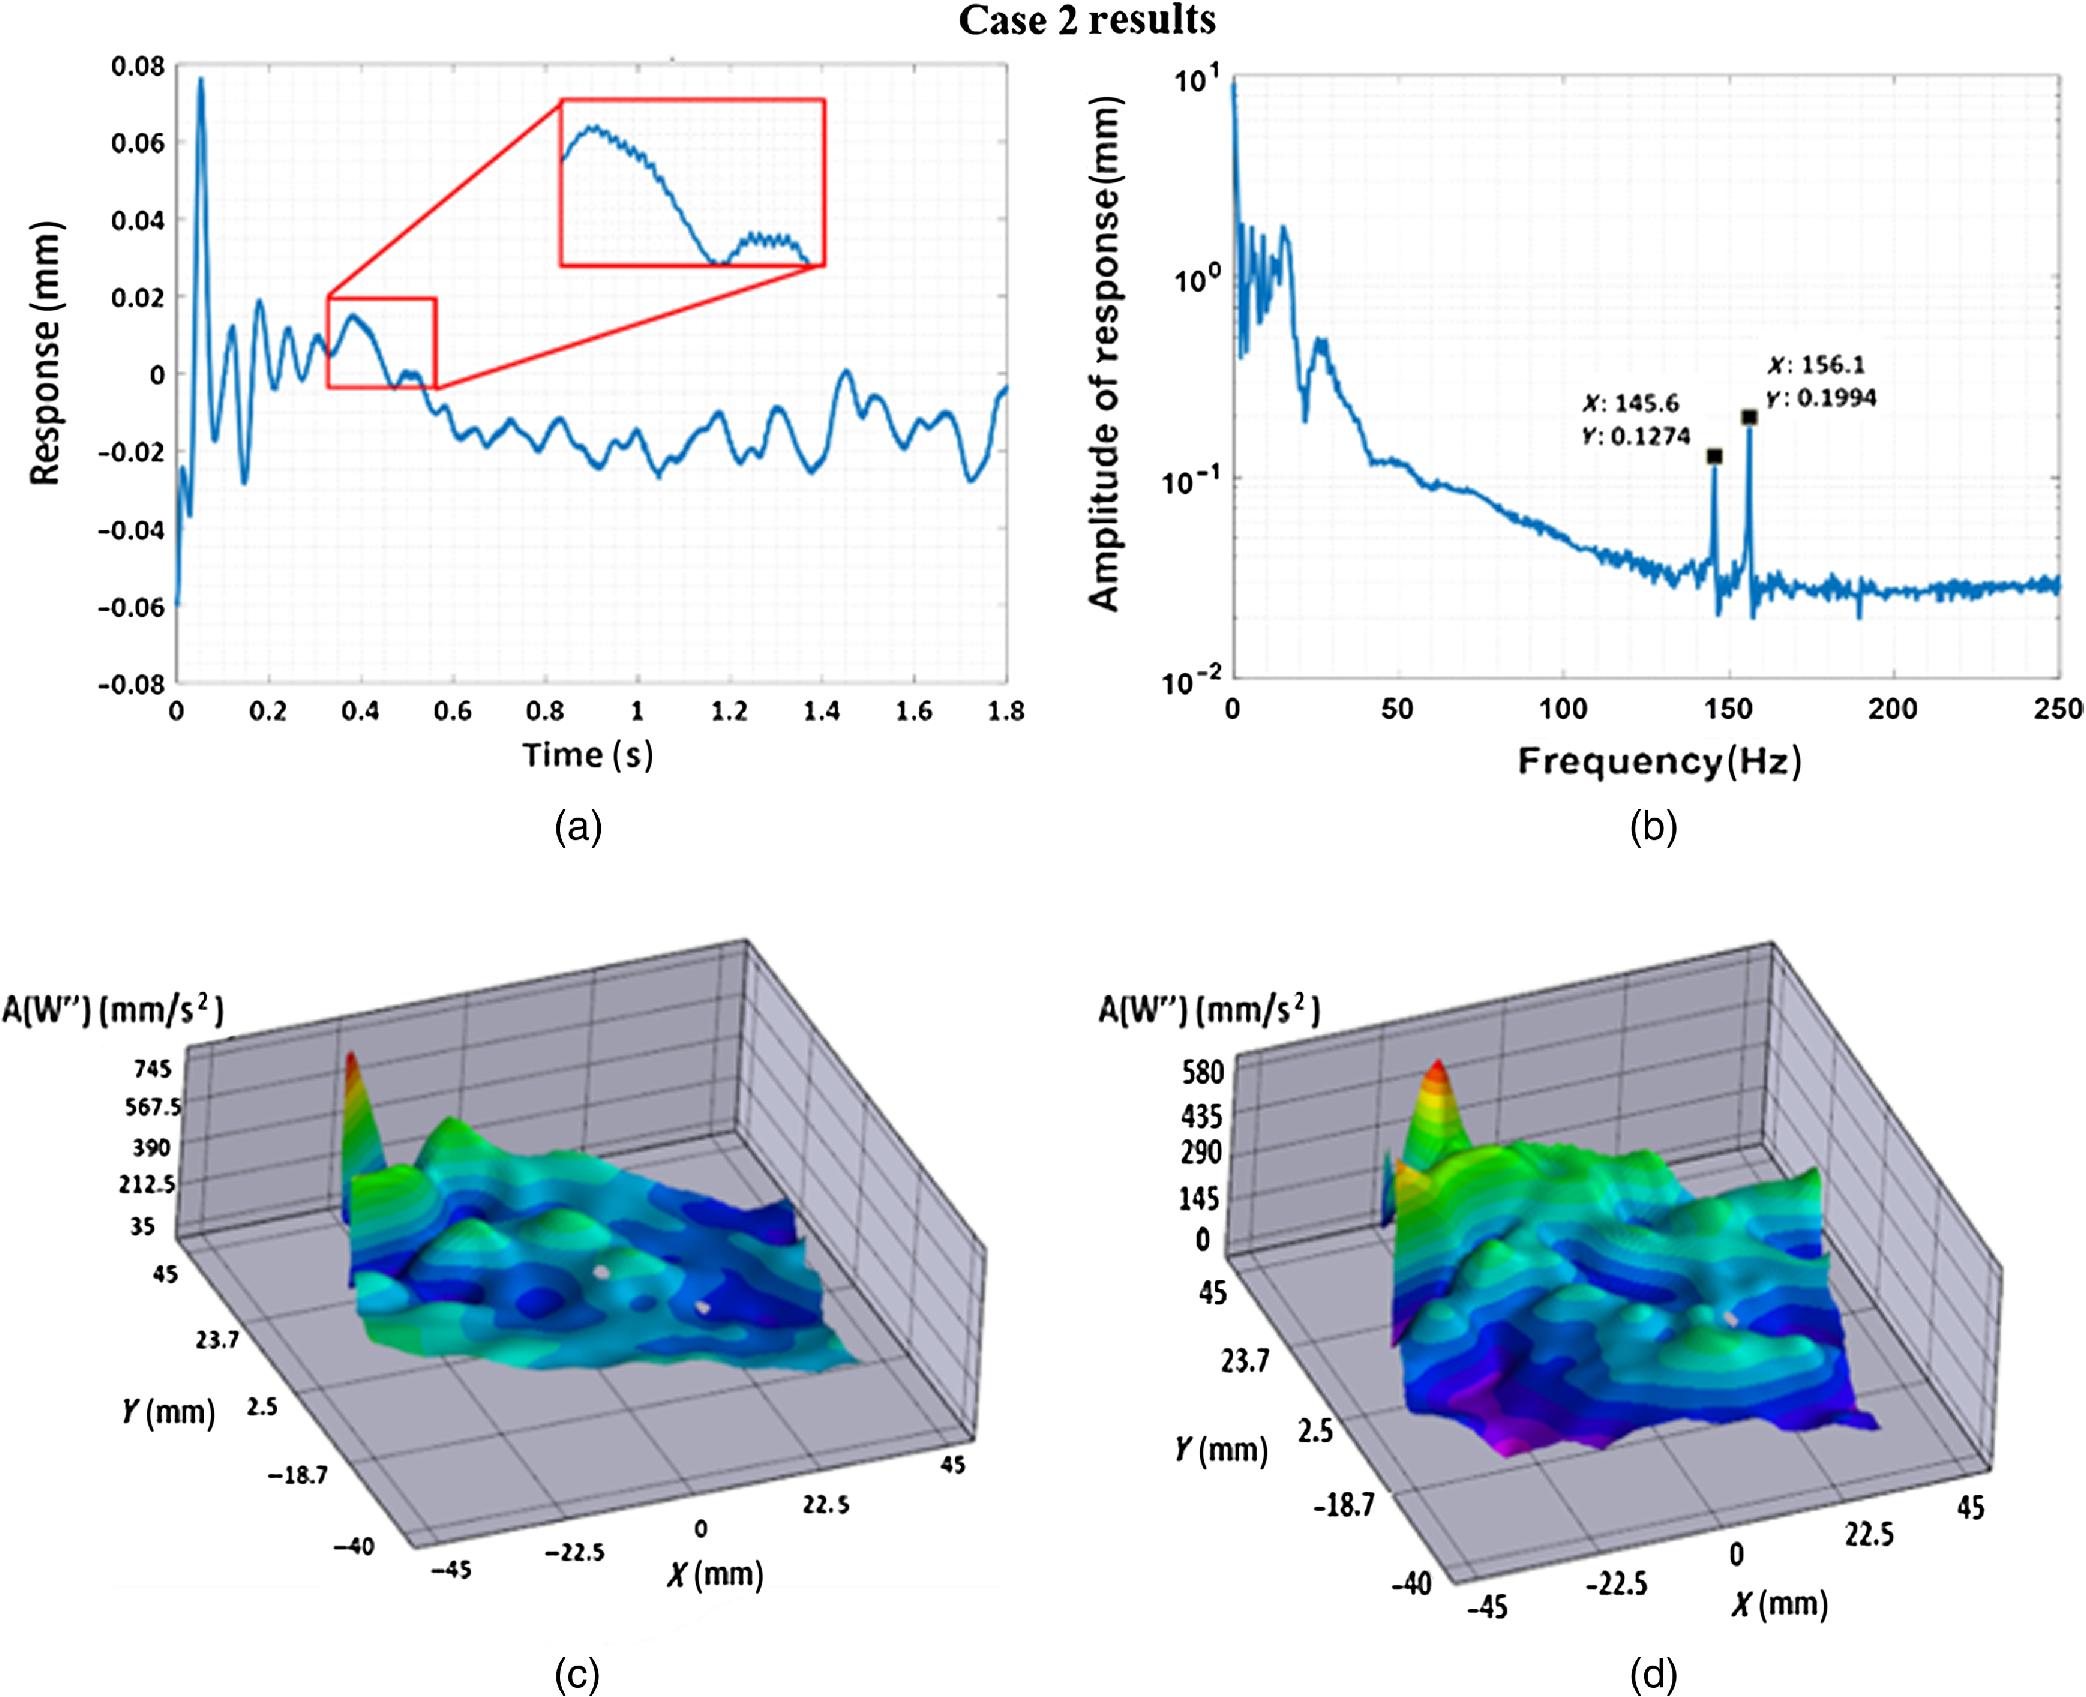 Vibration analysis of healthy skin: toward a noninvasive